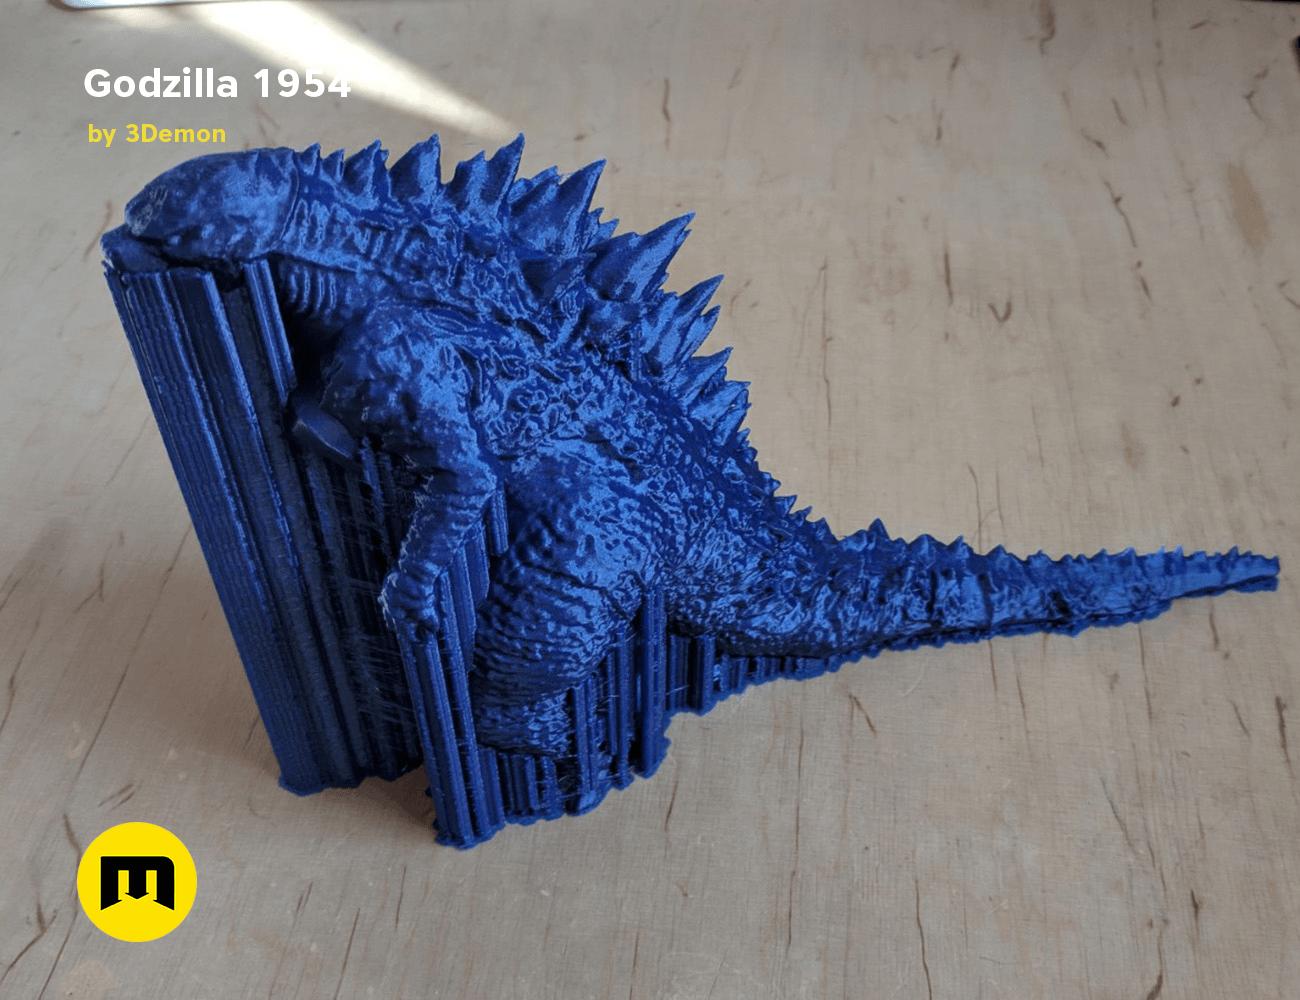 IMG_20190225_114219.png Download free OBJ file Godzilla 1954 figure and bottle opener • 3D printer model, 3D-mon